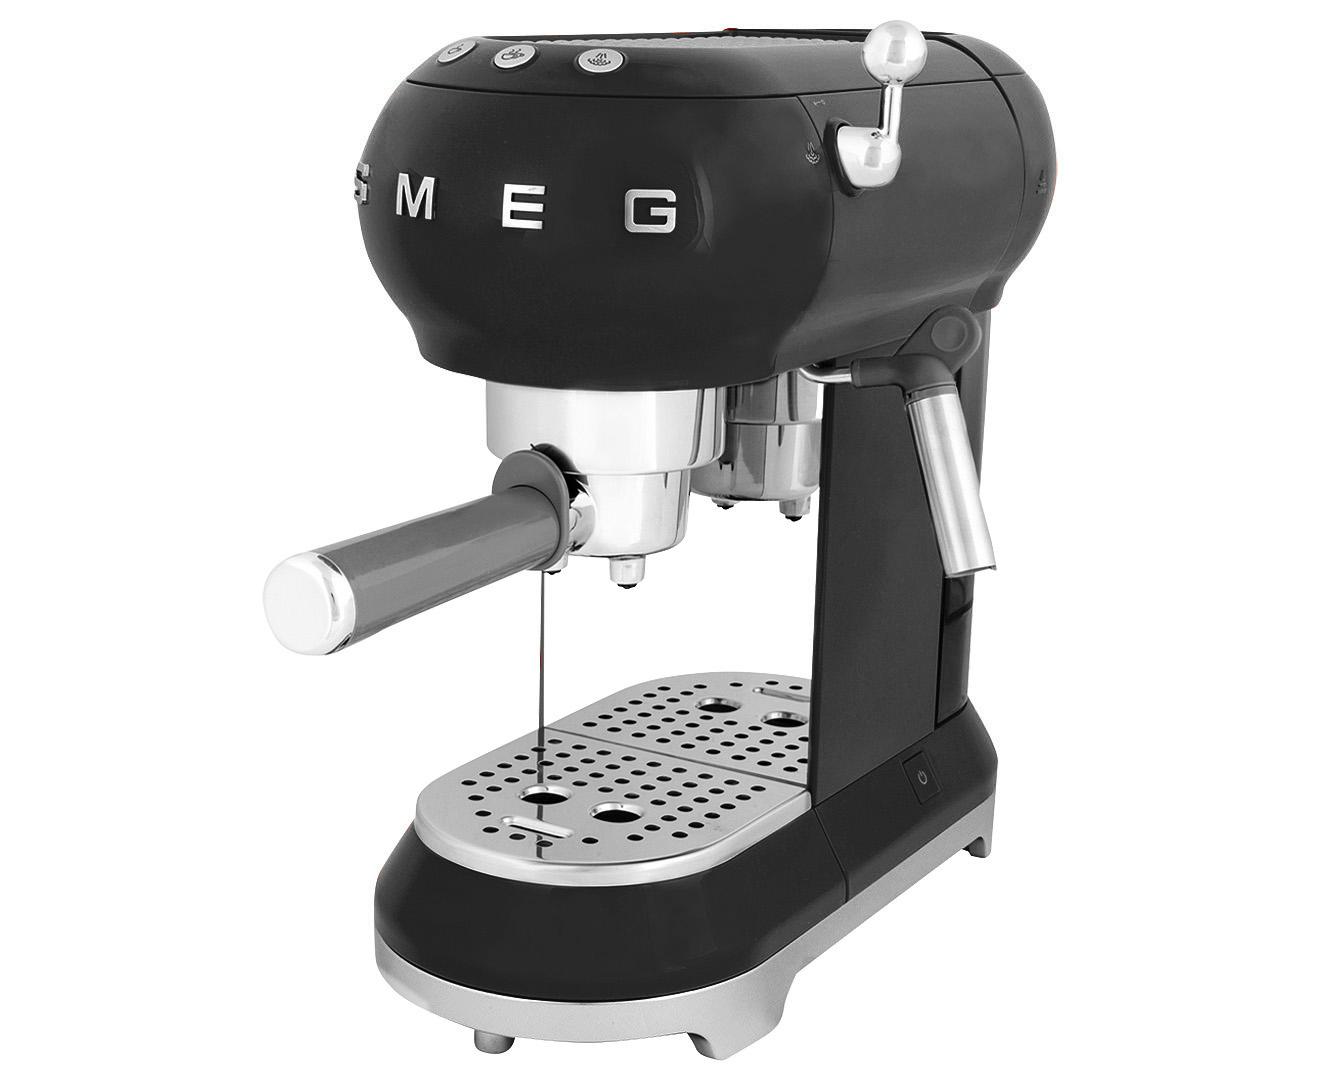 Smeg ECF01 Espresso Coffee Machine - Black 8017709229948 ...